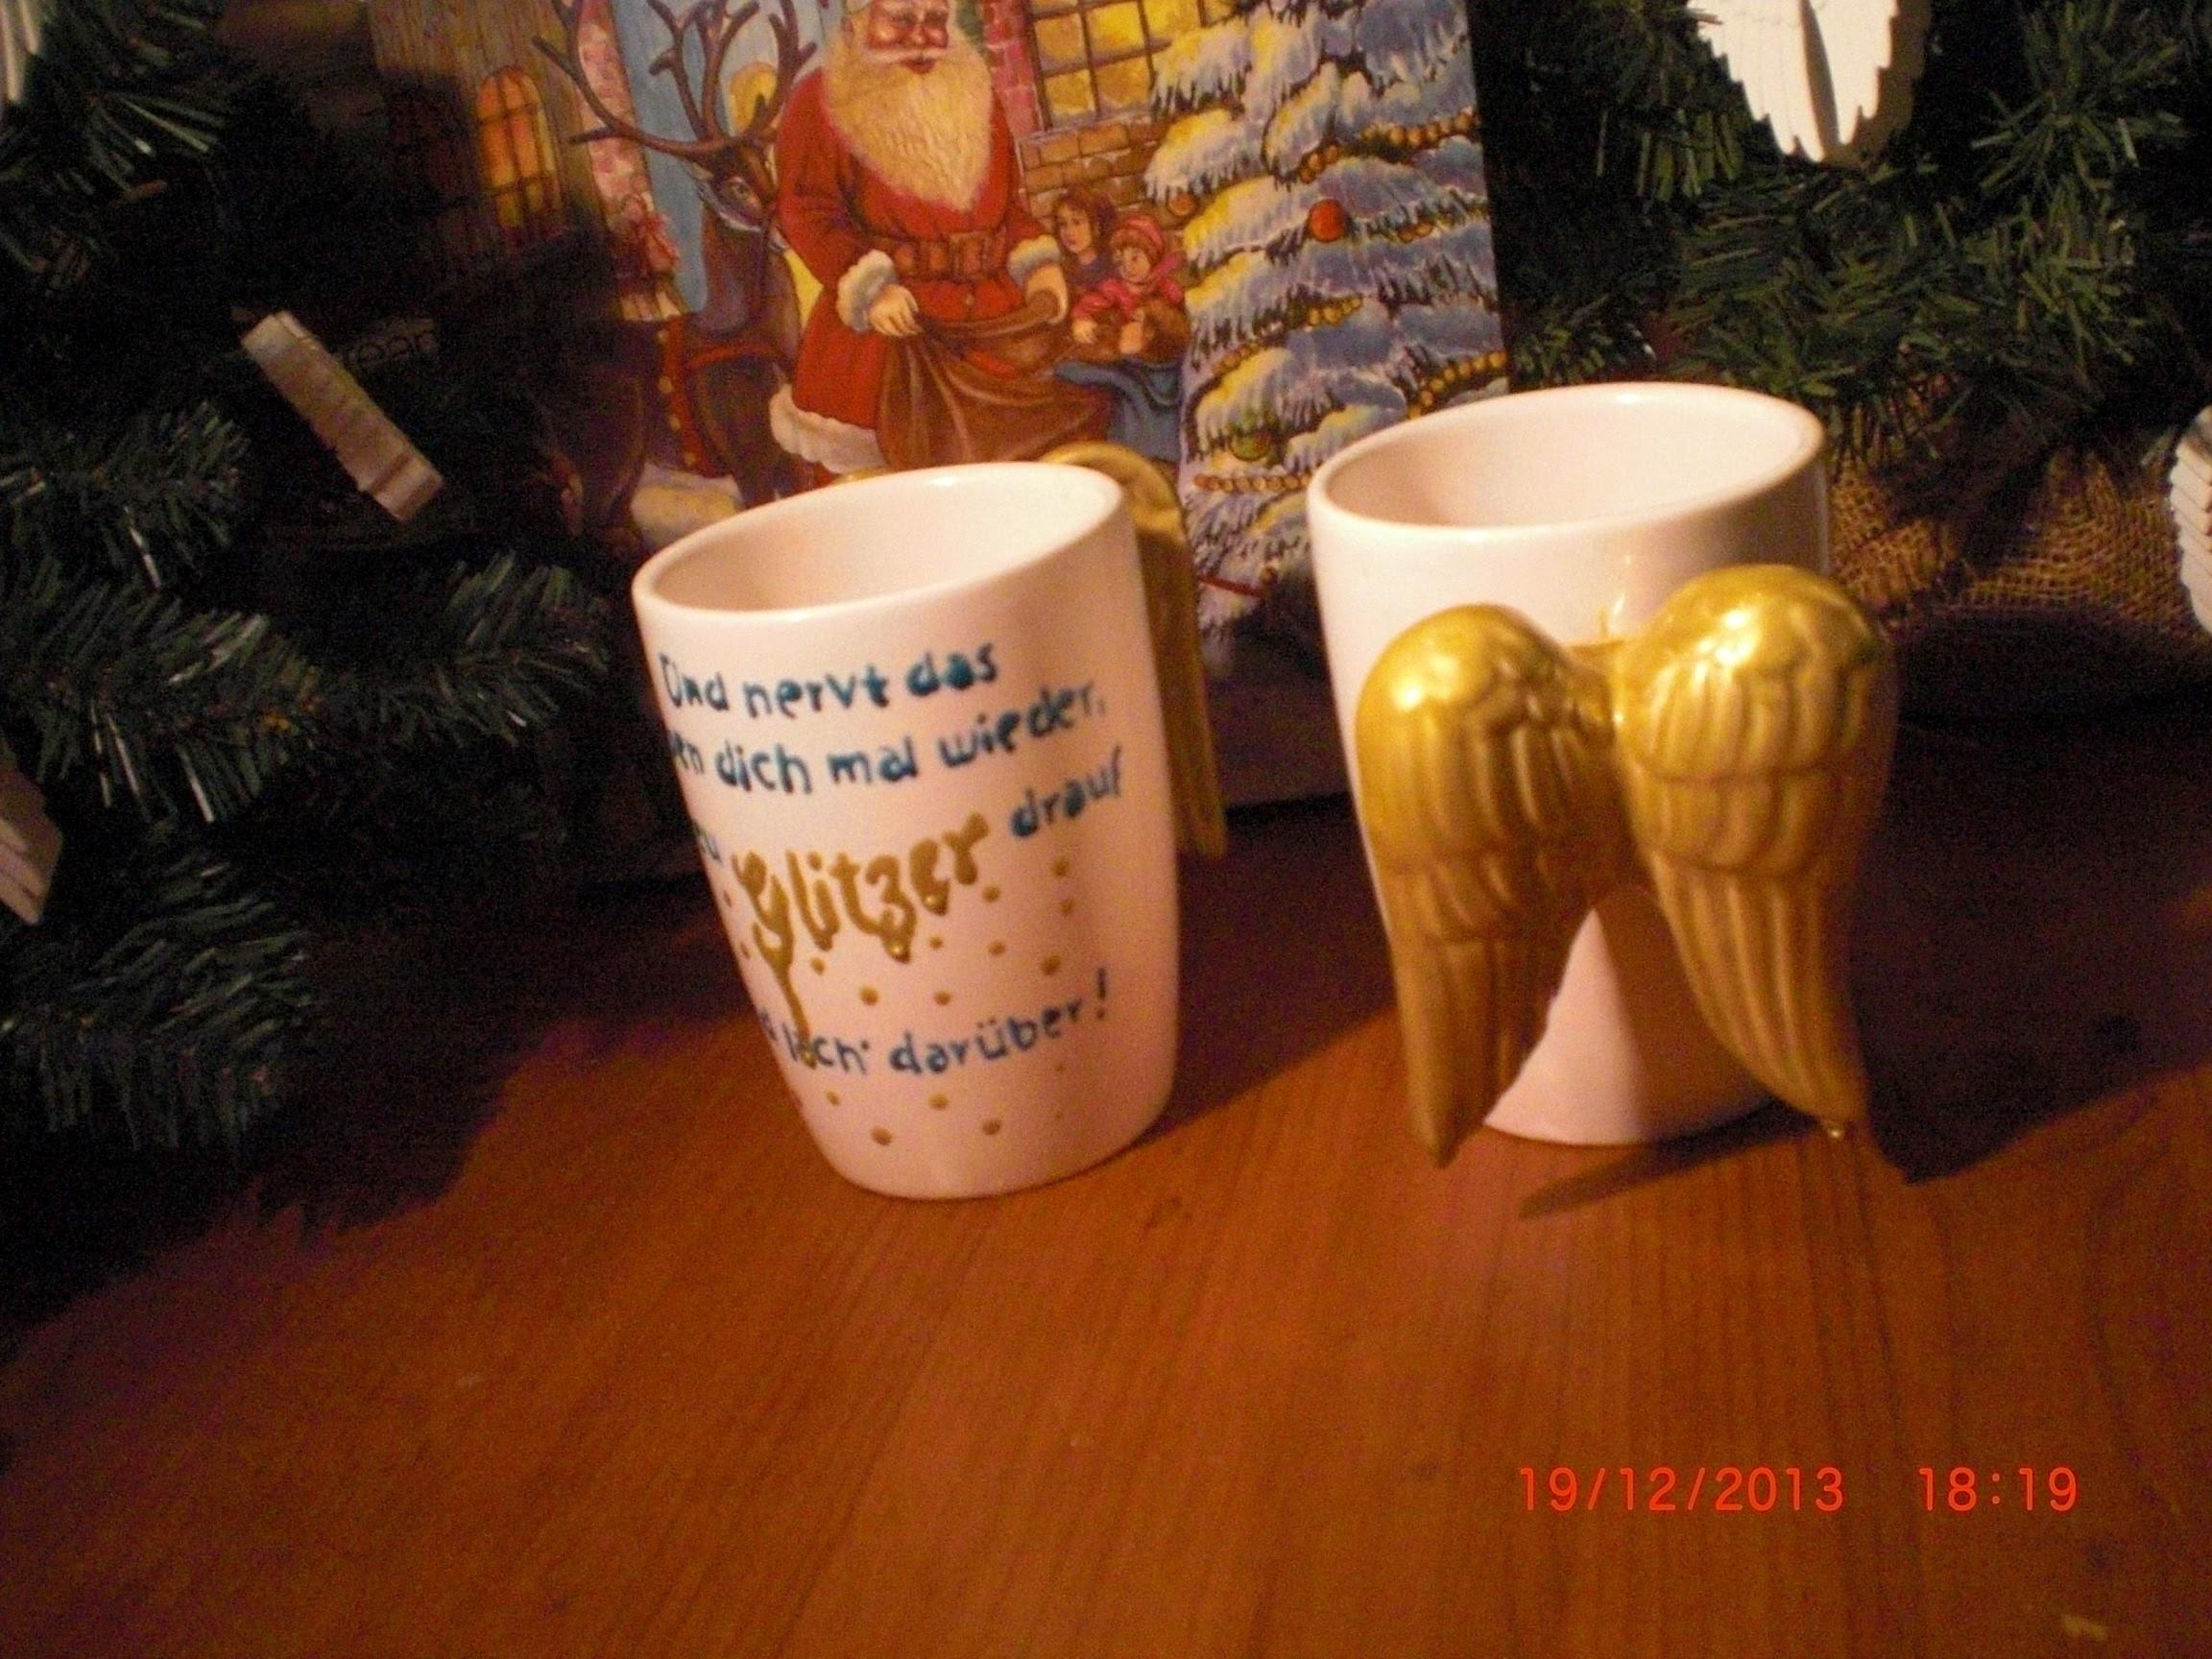 DIY - Anleitung - Weihnachtsgeschenk - Tassen bemalen - Porzellanmalerei